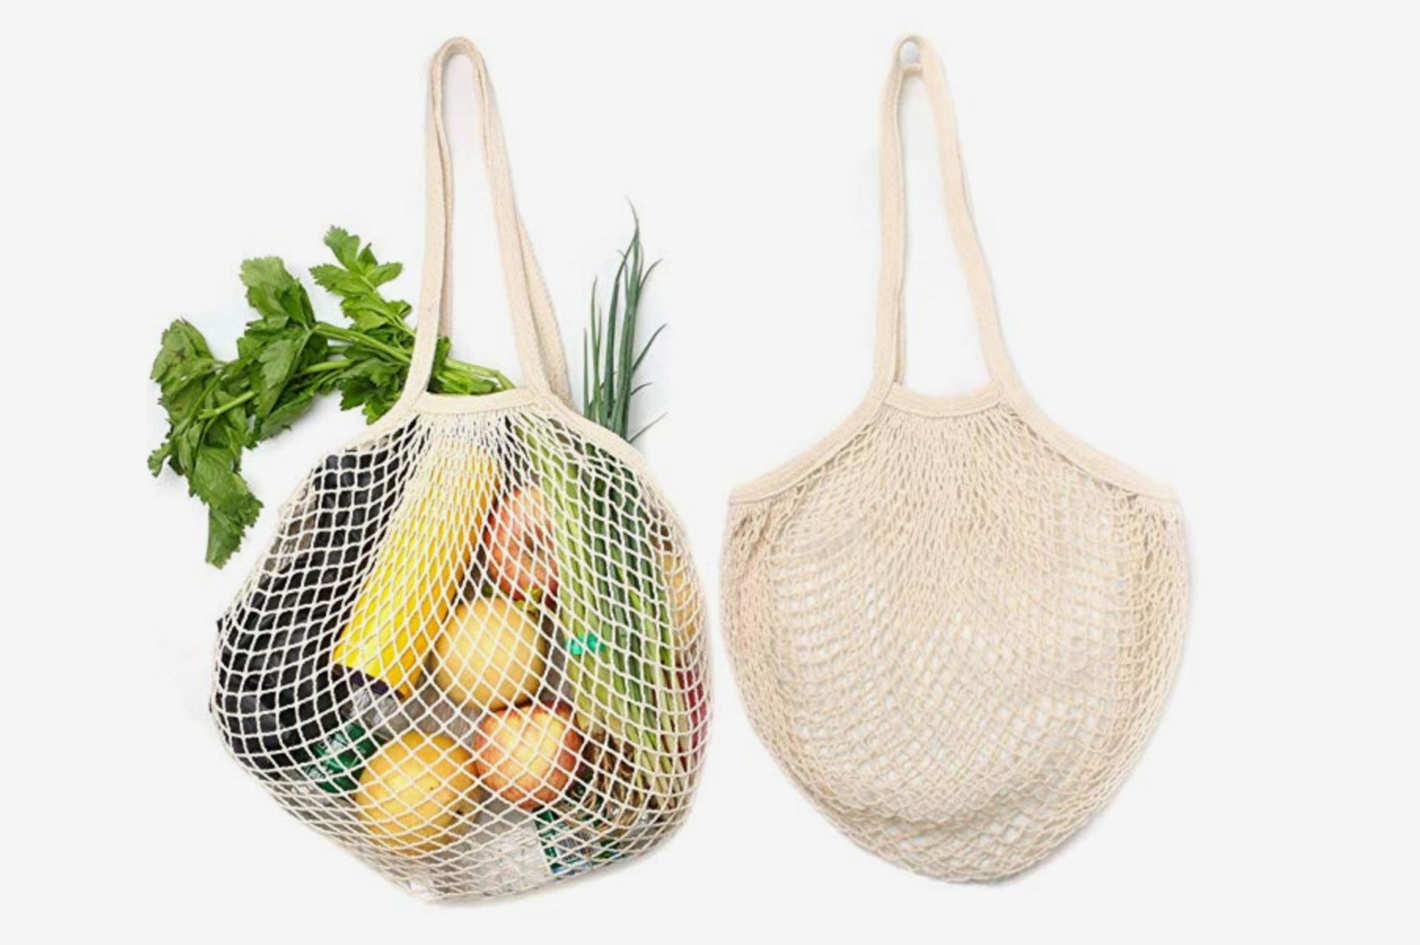 Reusable Organic Cotton Grocery Bags